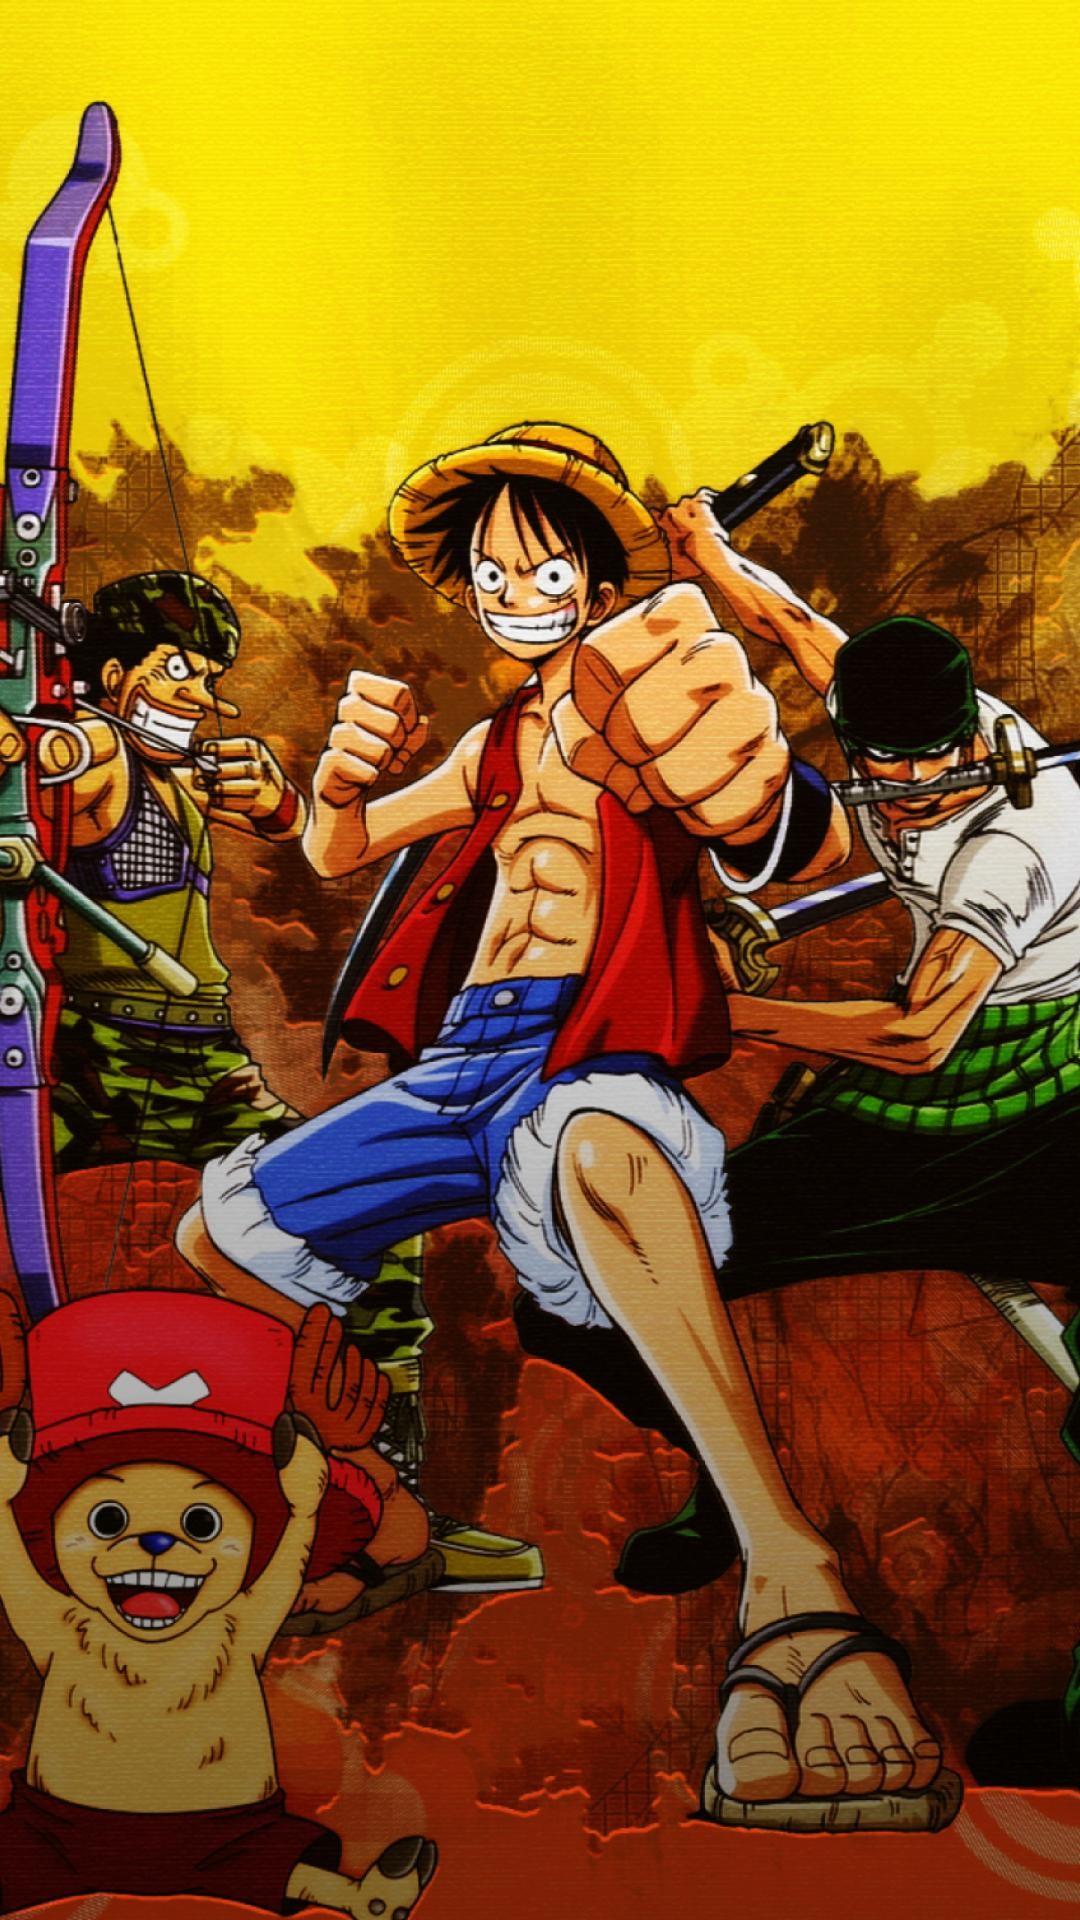 wallpaper.wiki-Free-One-Piece-Iphone-Wallpaper-Download-